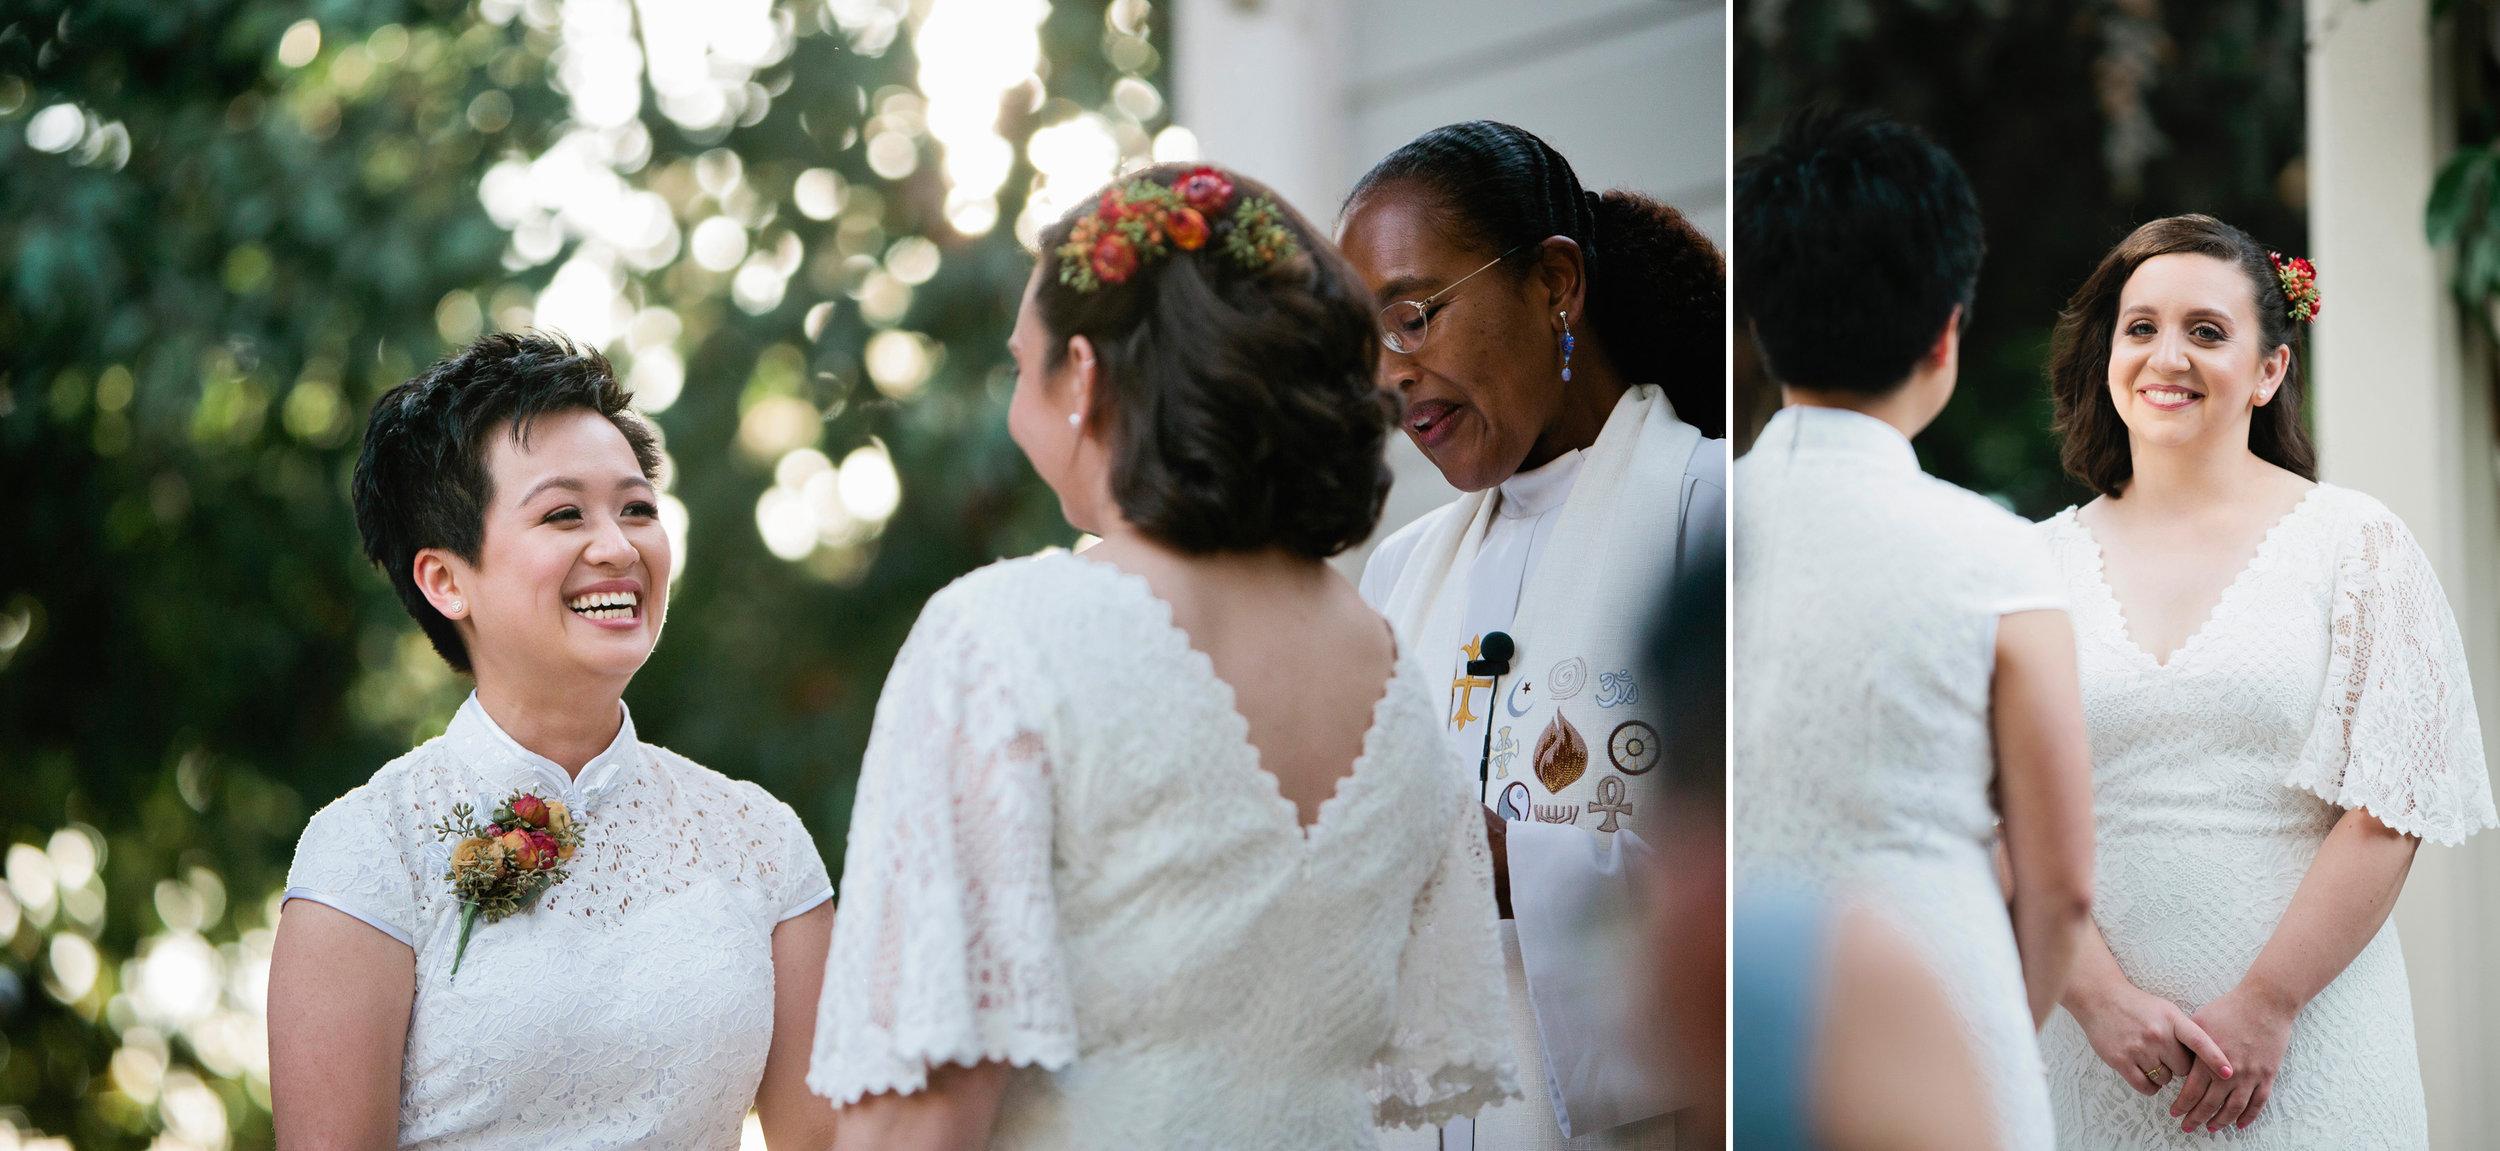 Oakland-Preservation-Park-Wedding-020 copy.jpg